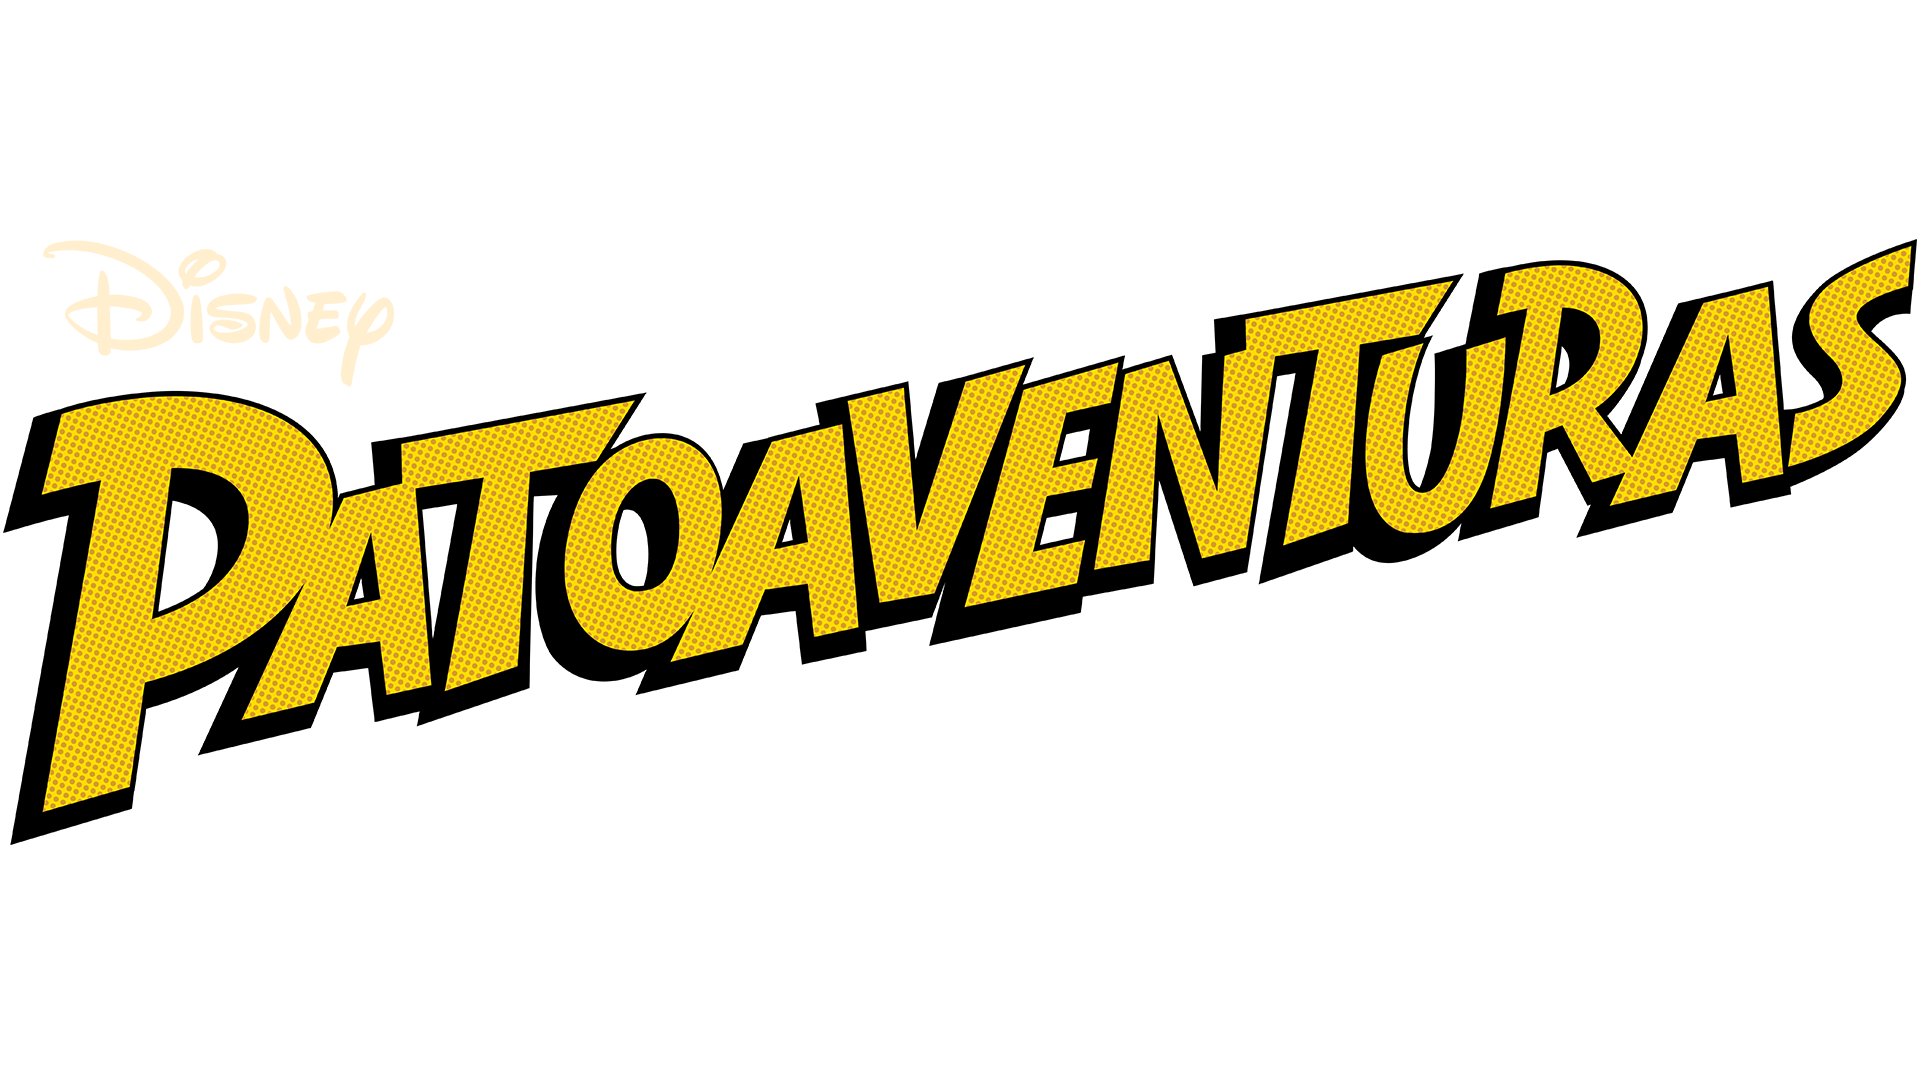 PatoaventurasNav